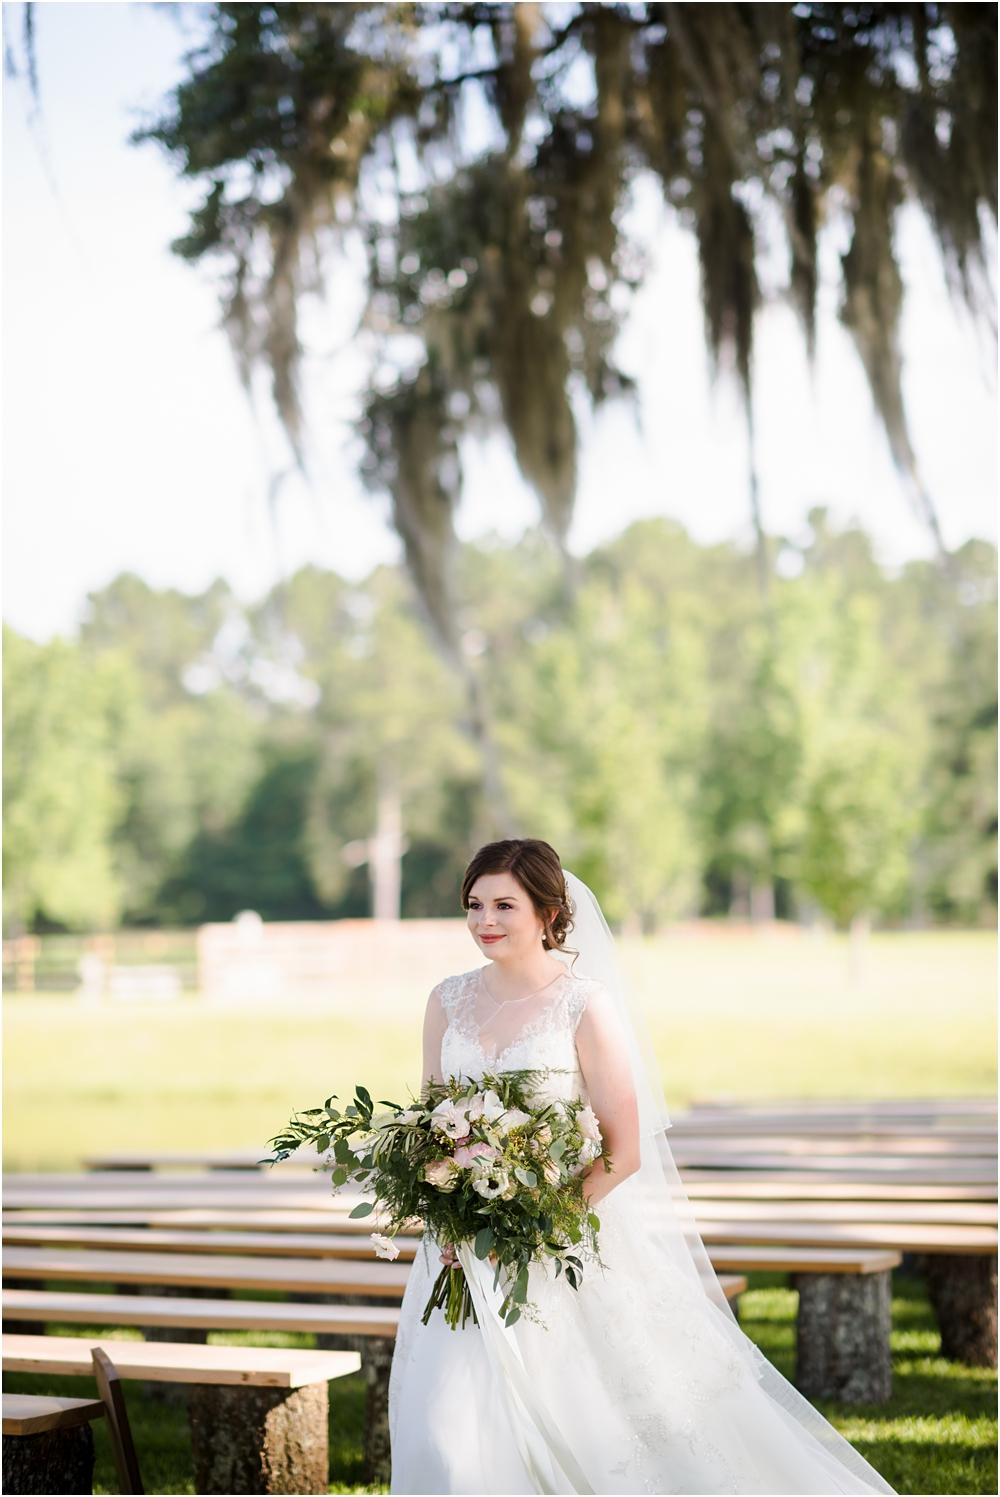 marianna-florida-wedding-photographer-kiersten-grant-49.jpg